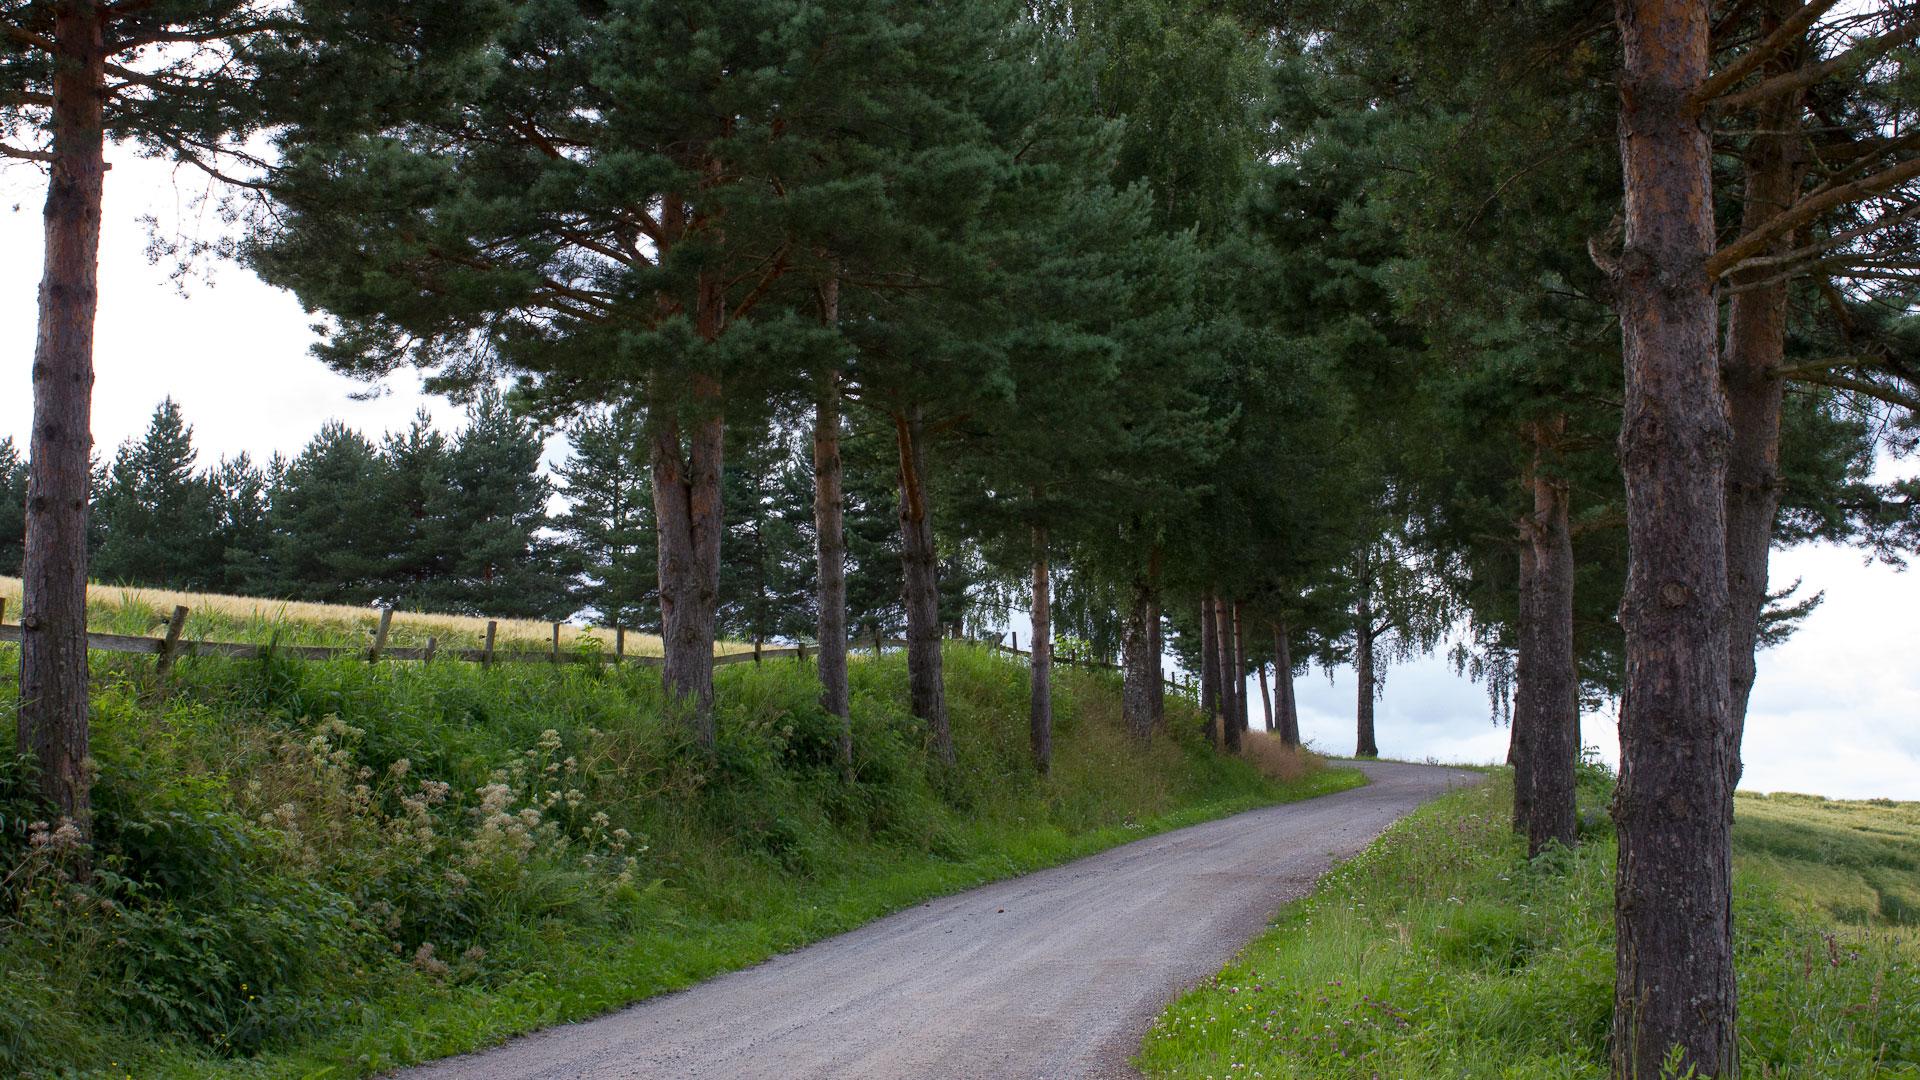 Deserted driveway